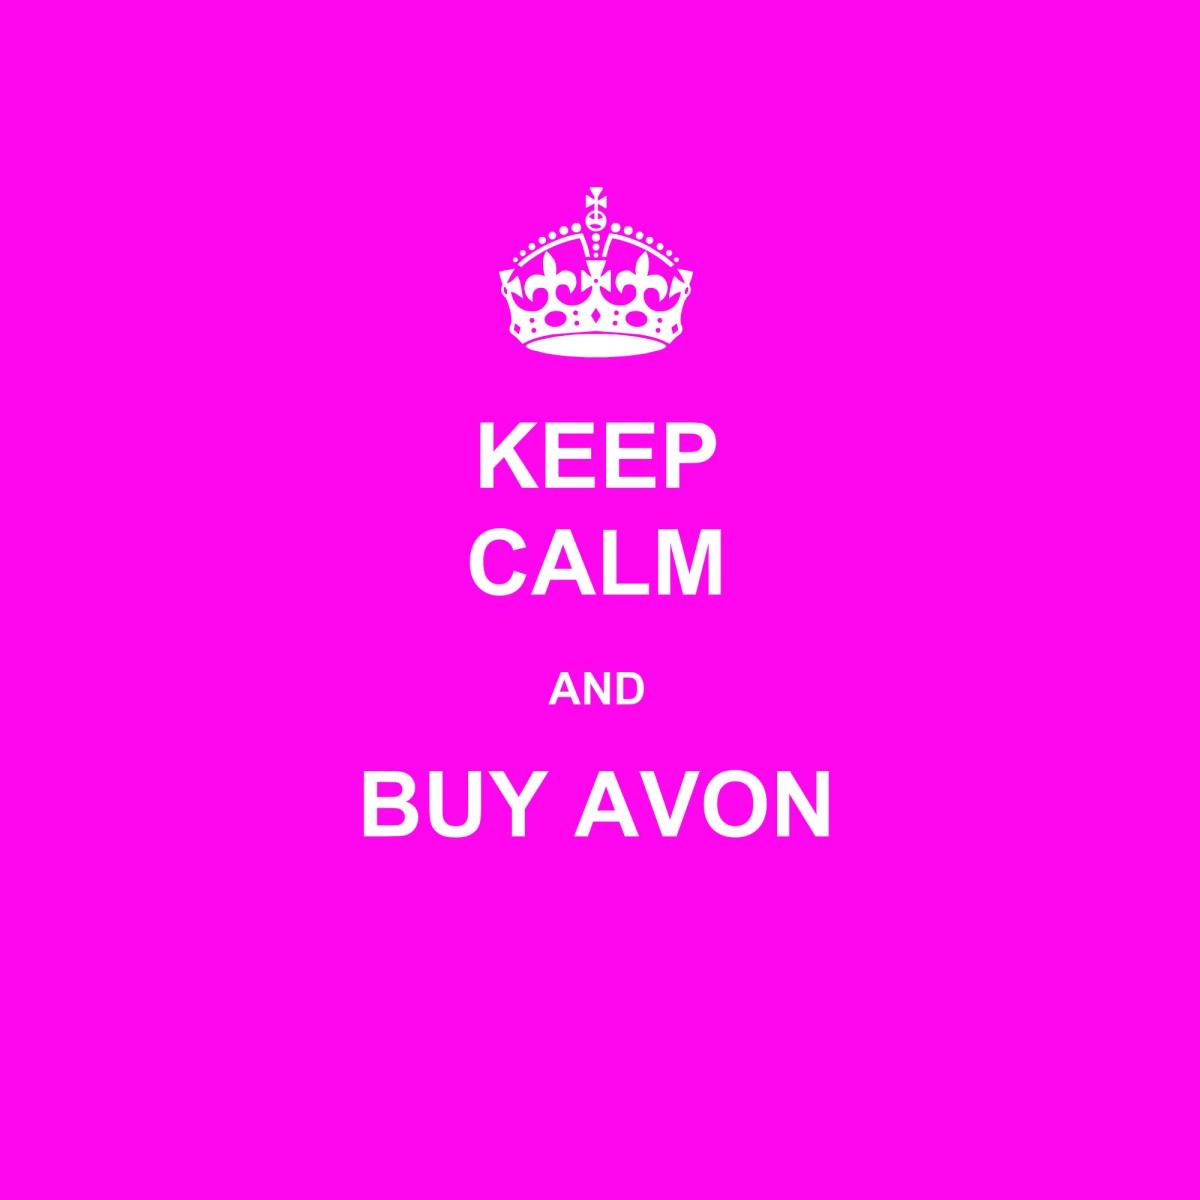 Reasons to Buy Avon Online